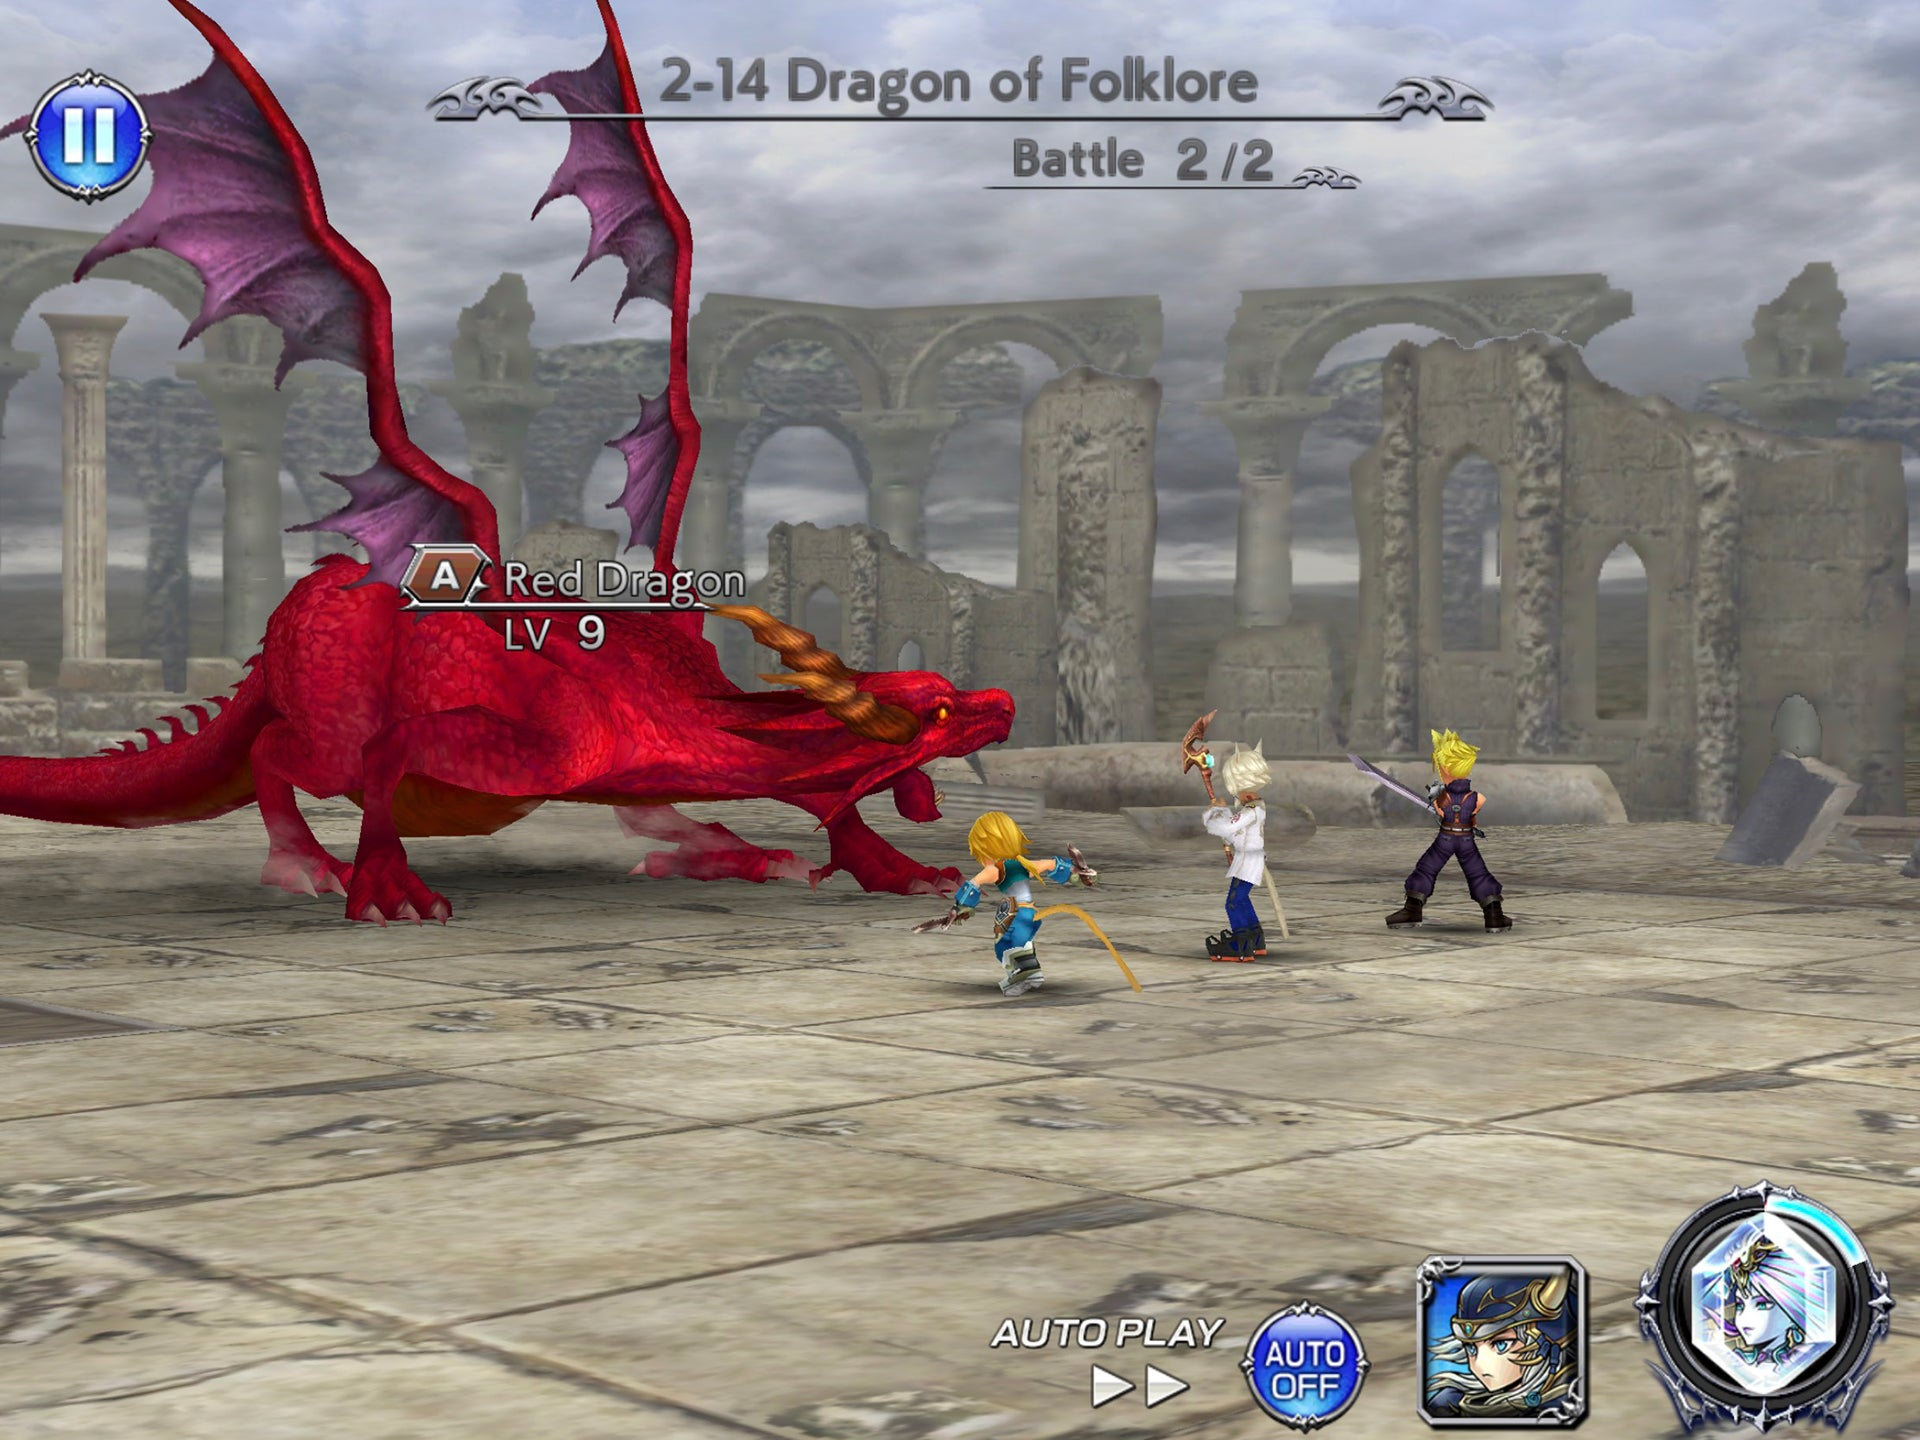 Dissidia Final Fantasy NT's Mobile Spin-Off Is Pretty Chill